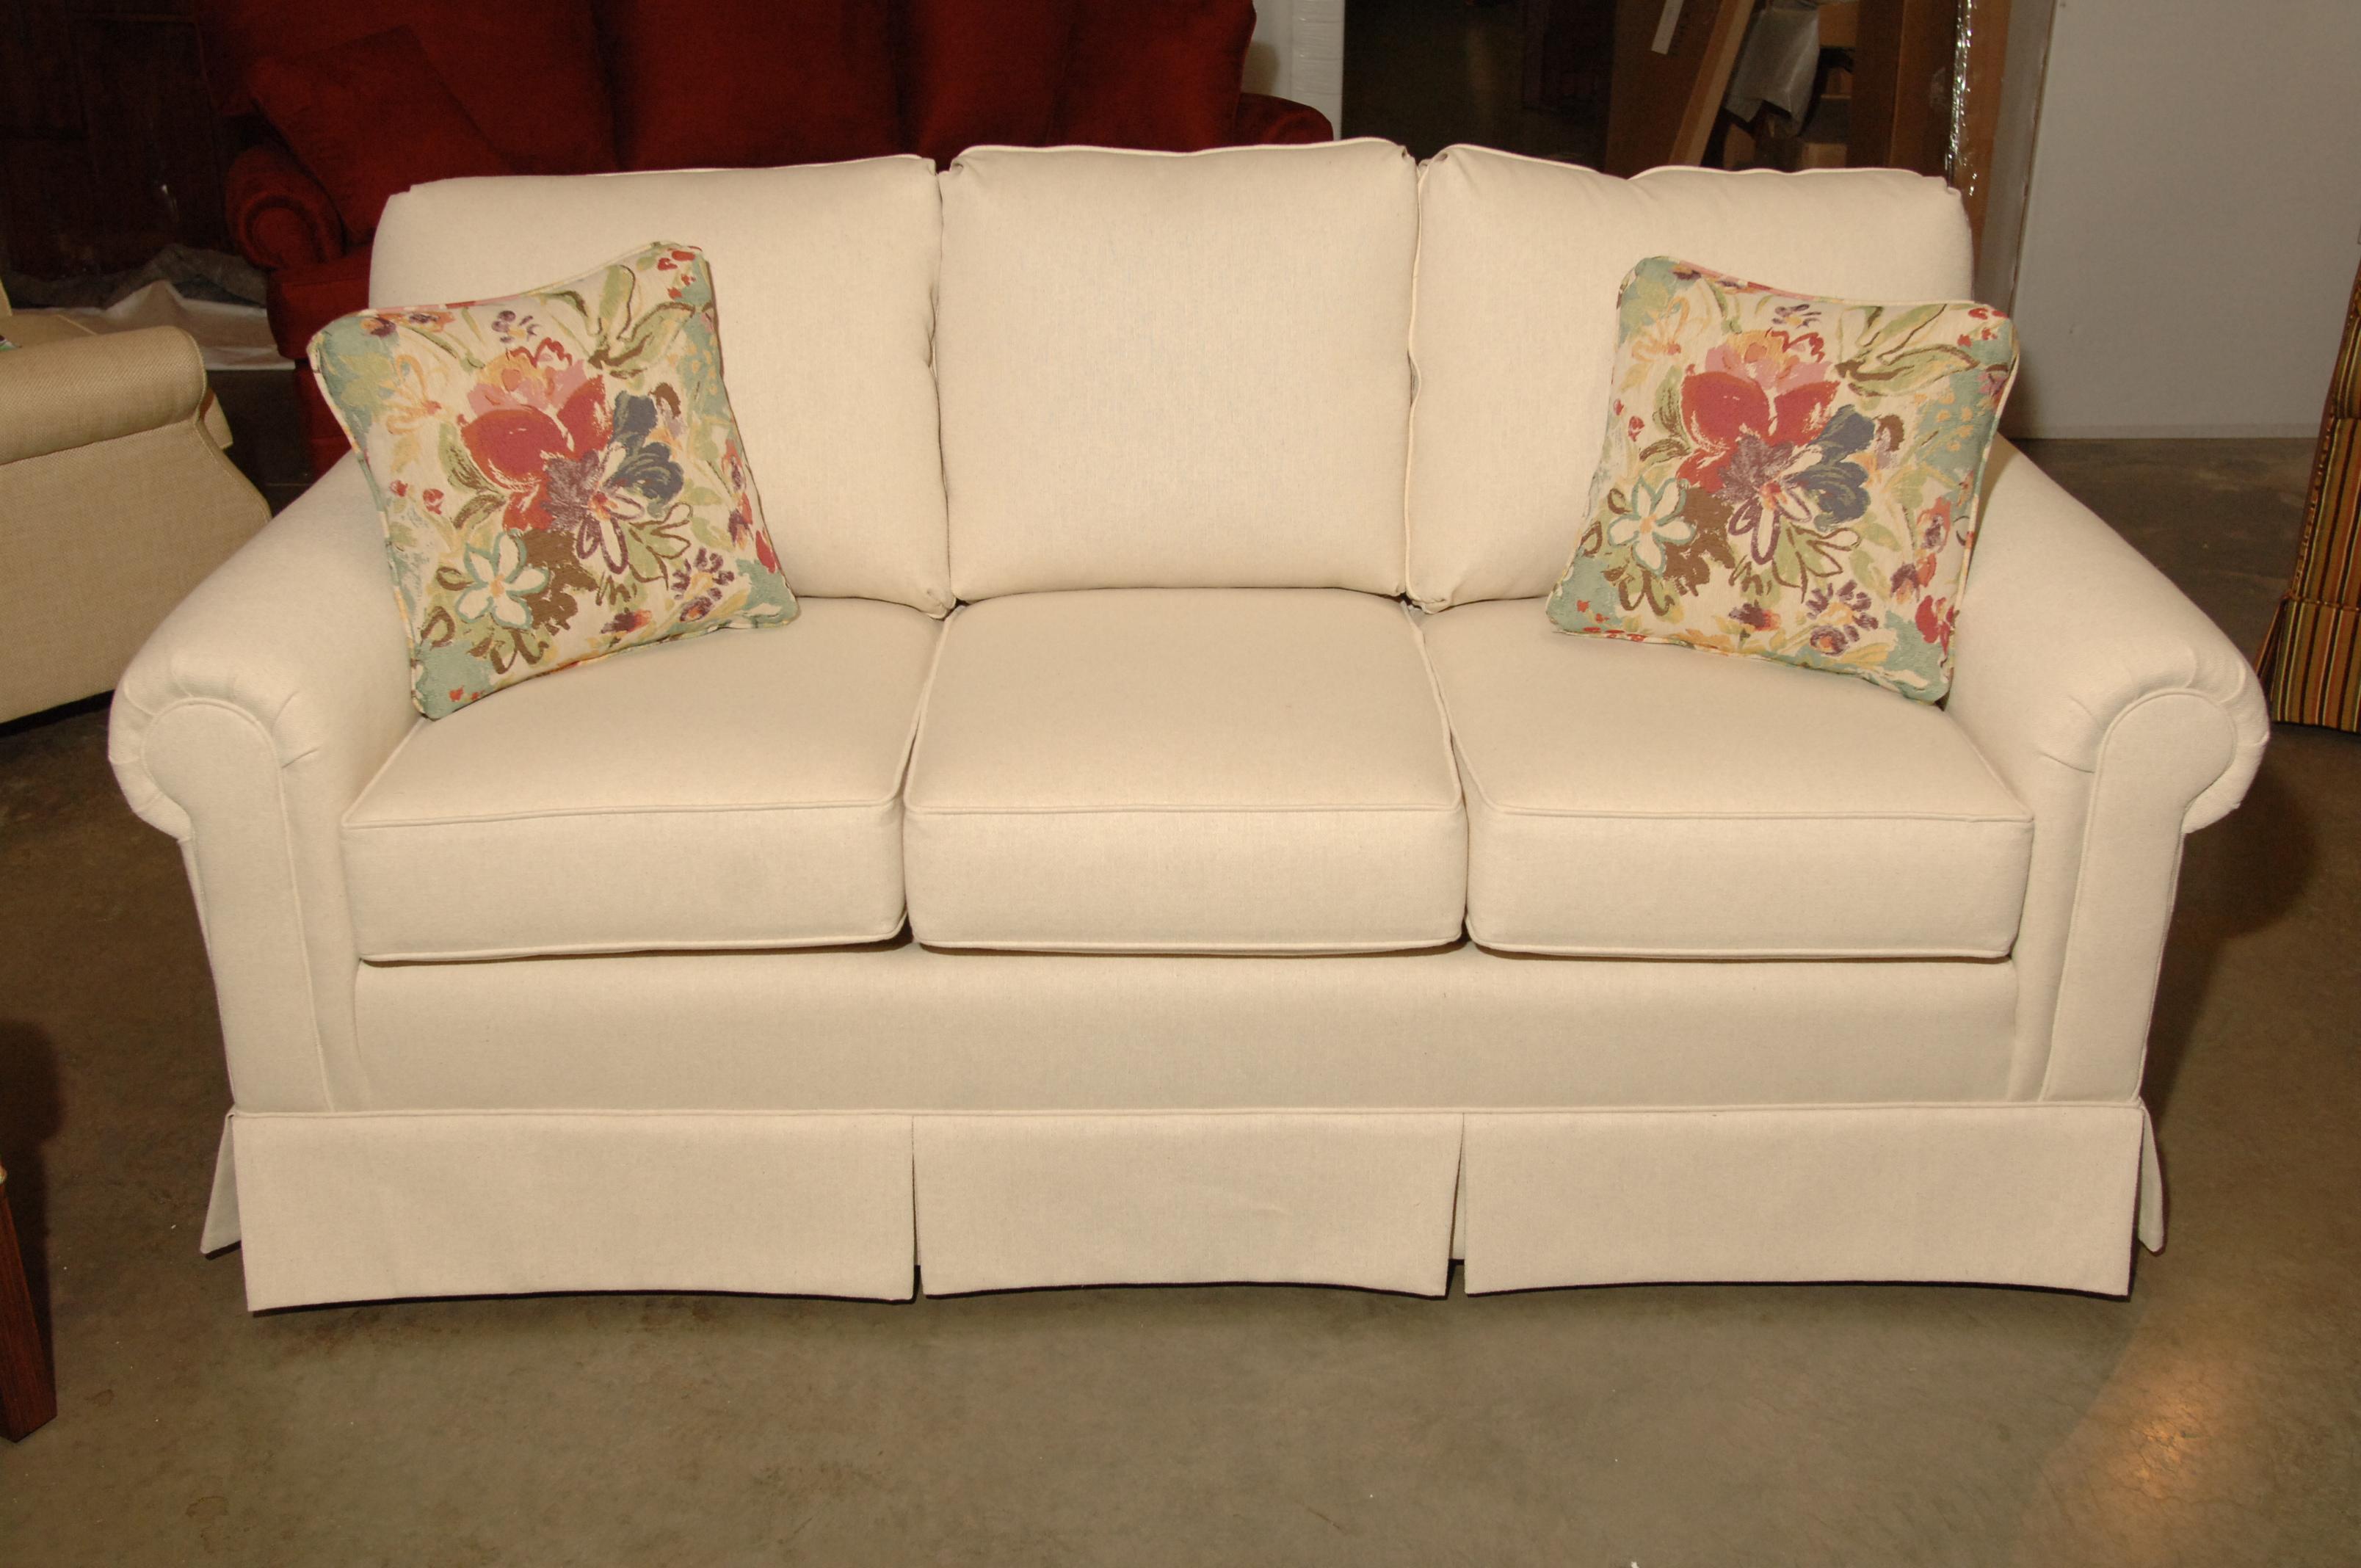 Virginia wayside furniture richmond virginia va for Wayside furniture